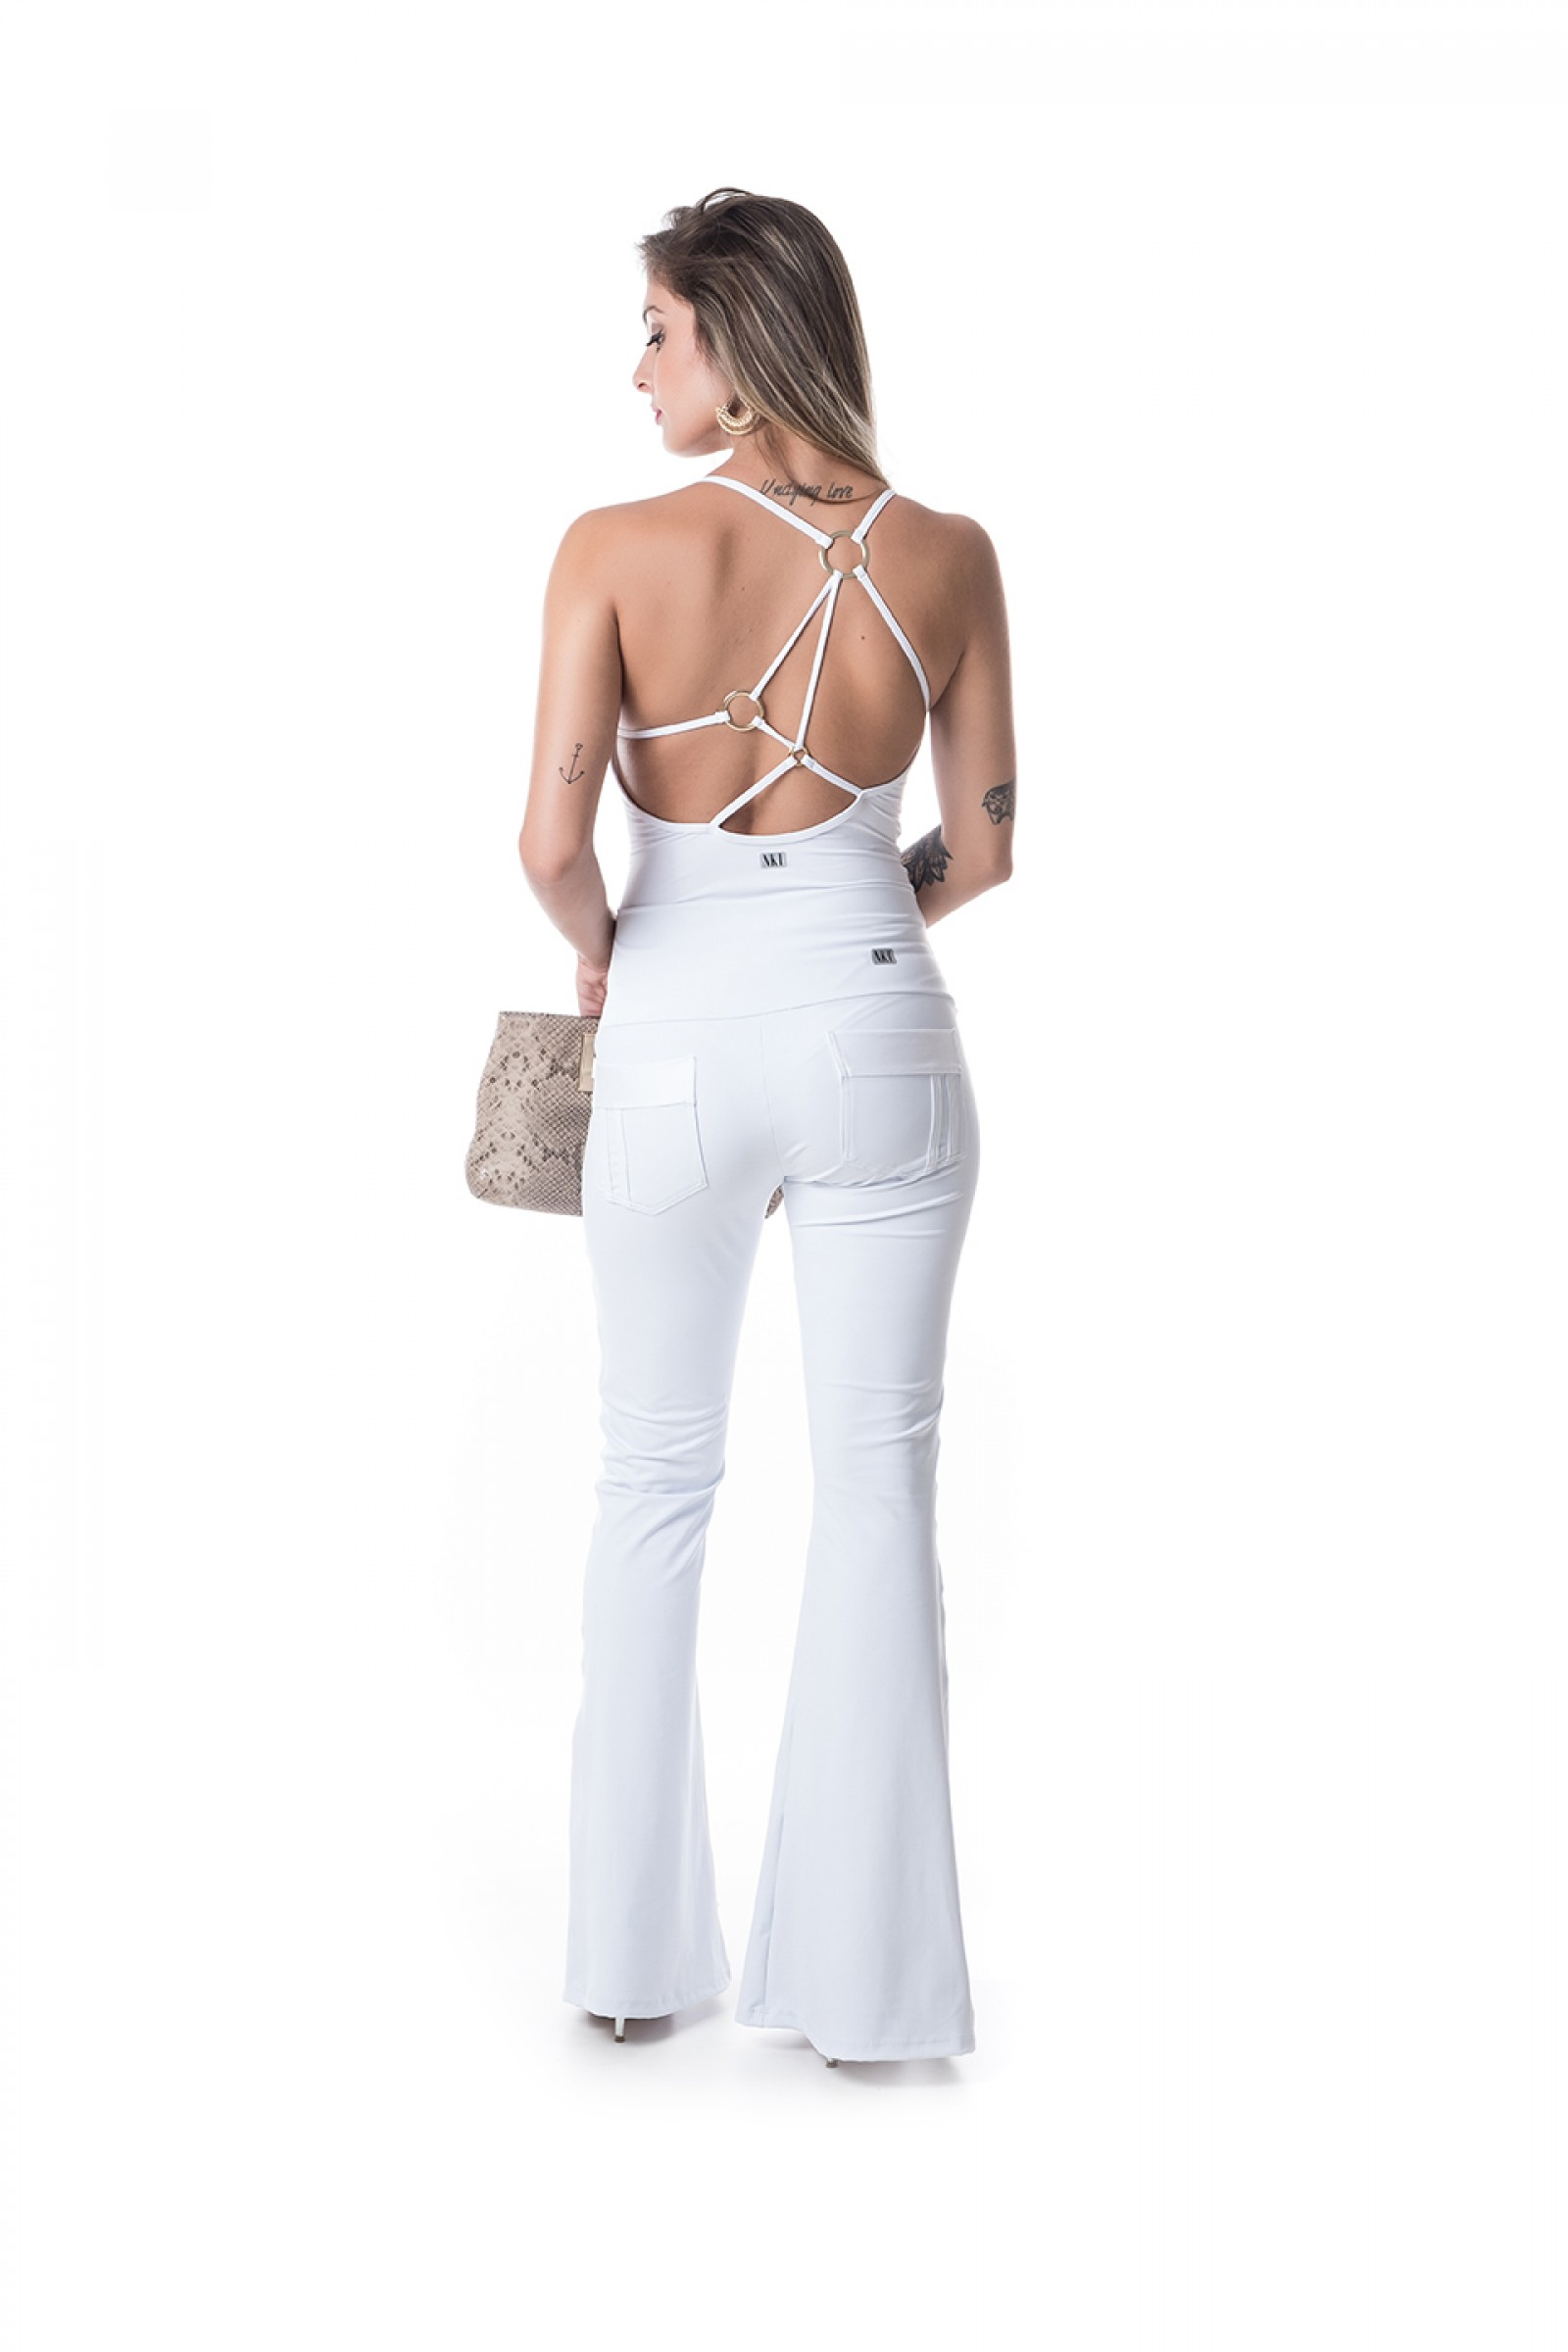 Flare Challenge Branco, Coleção Challenge - NKT Fitwear Moda Fitness